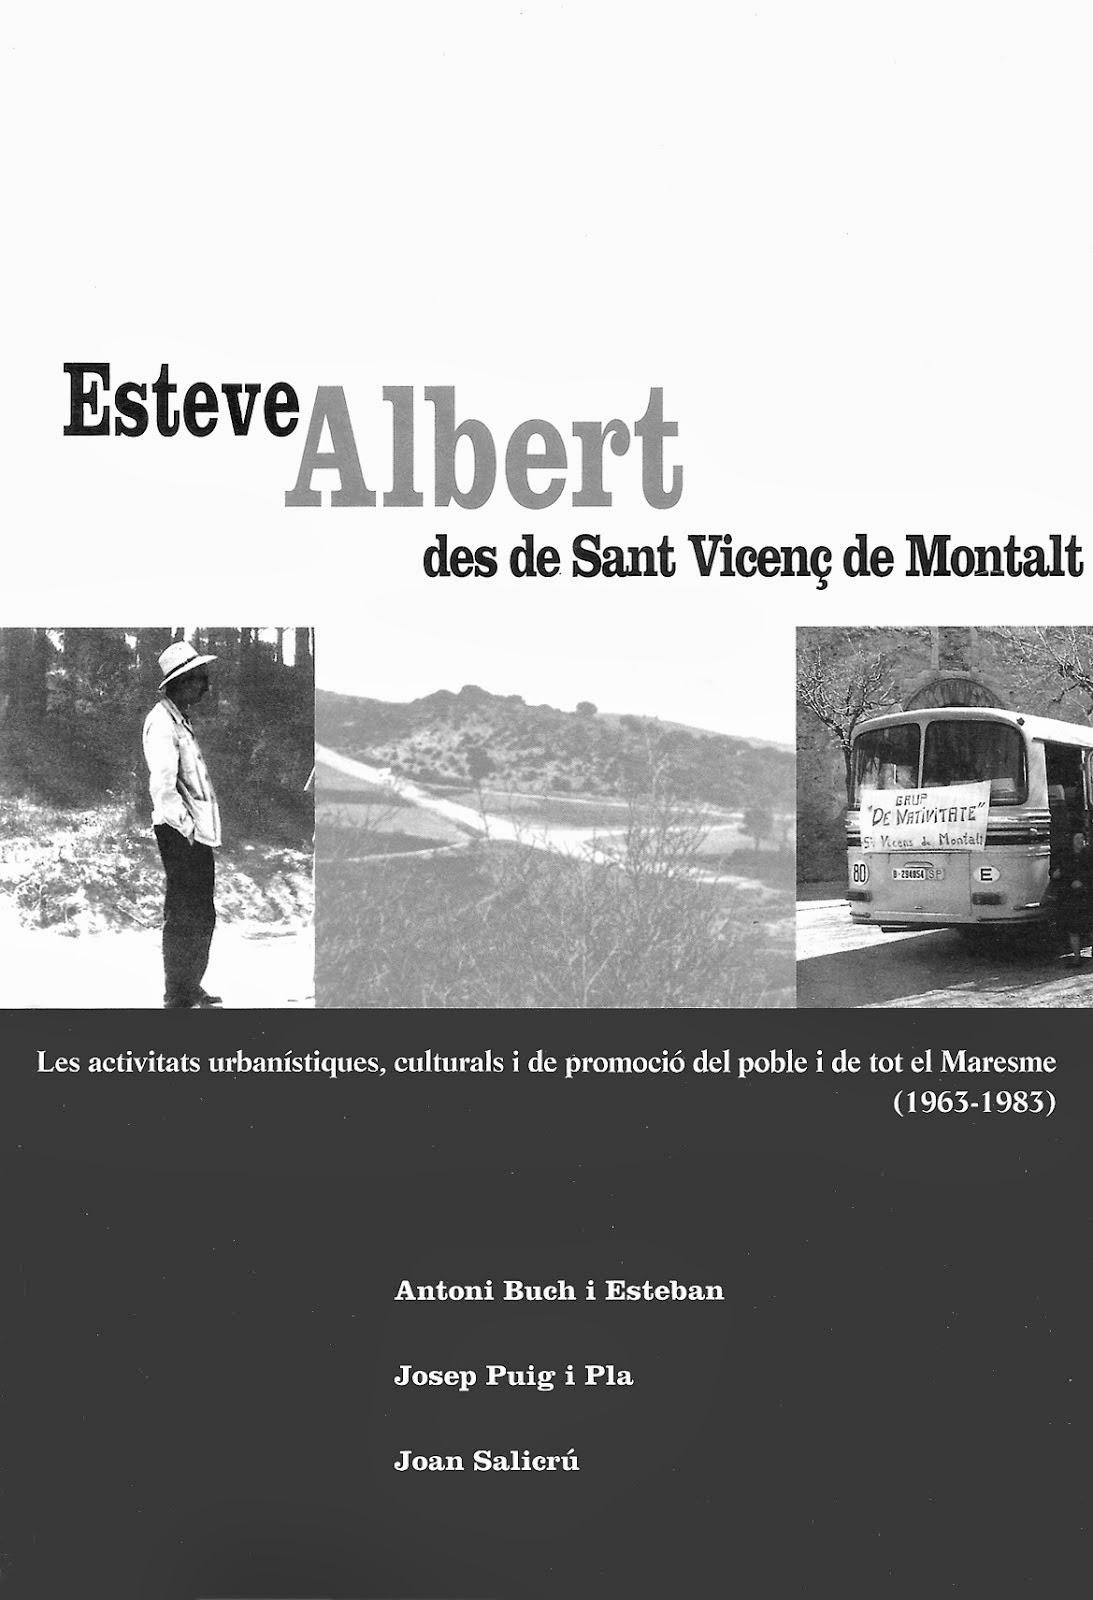 Esteve Albert i Sant Vicenç de Montalt